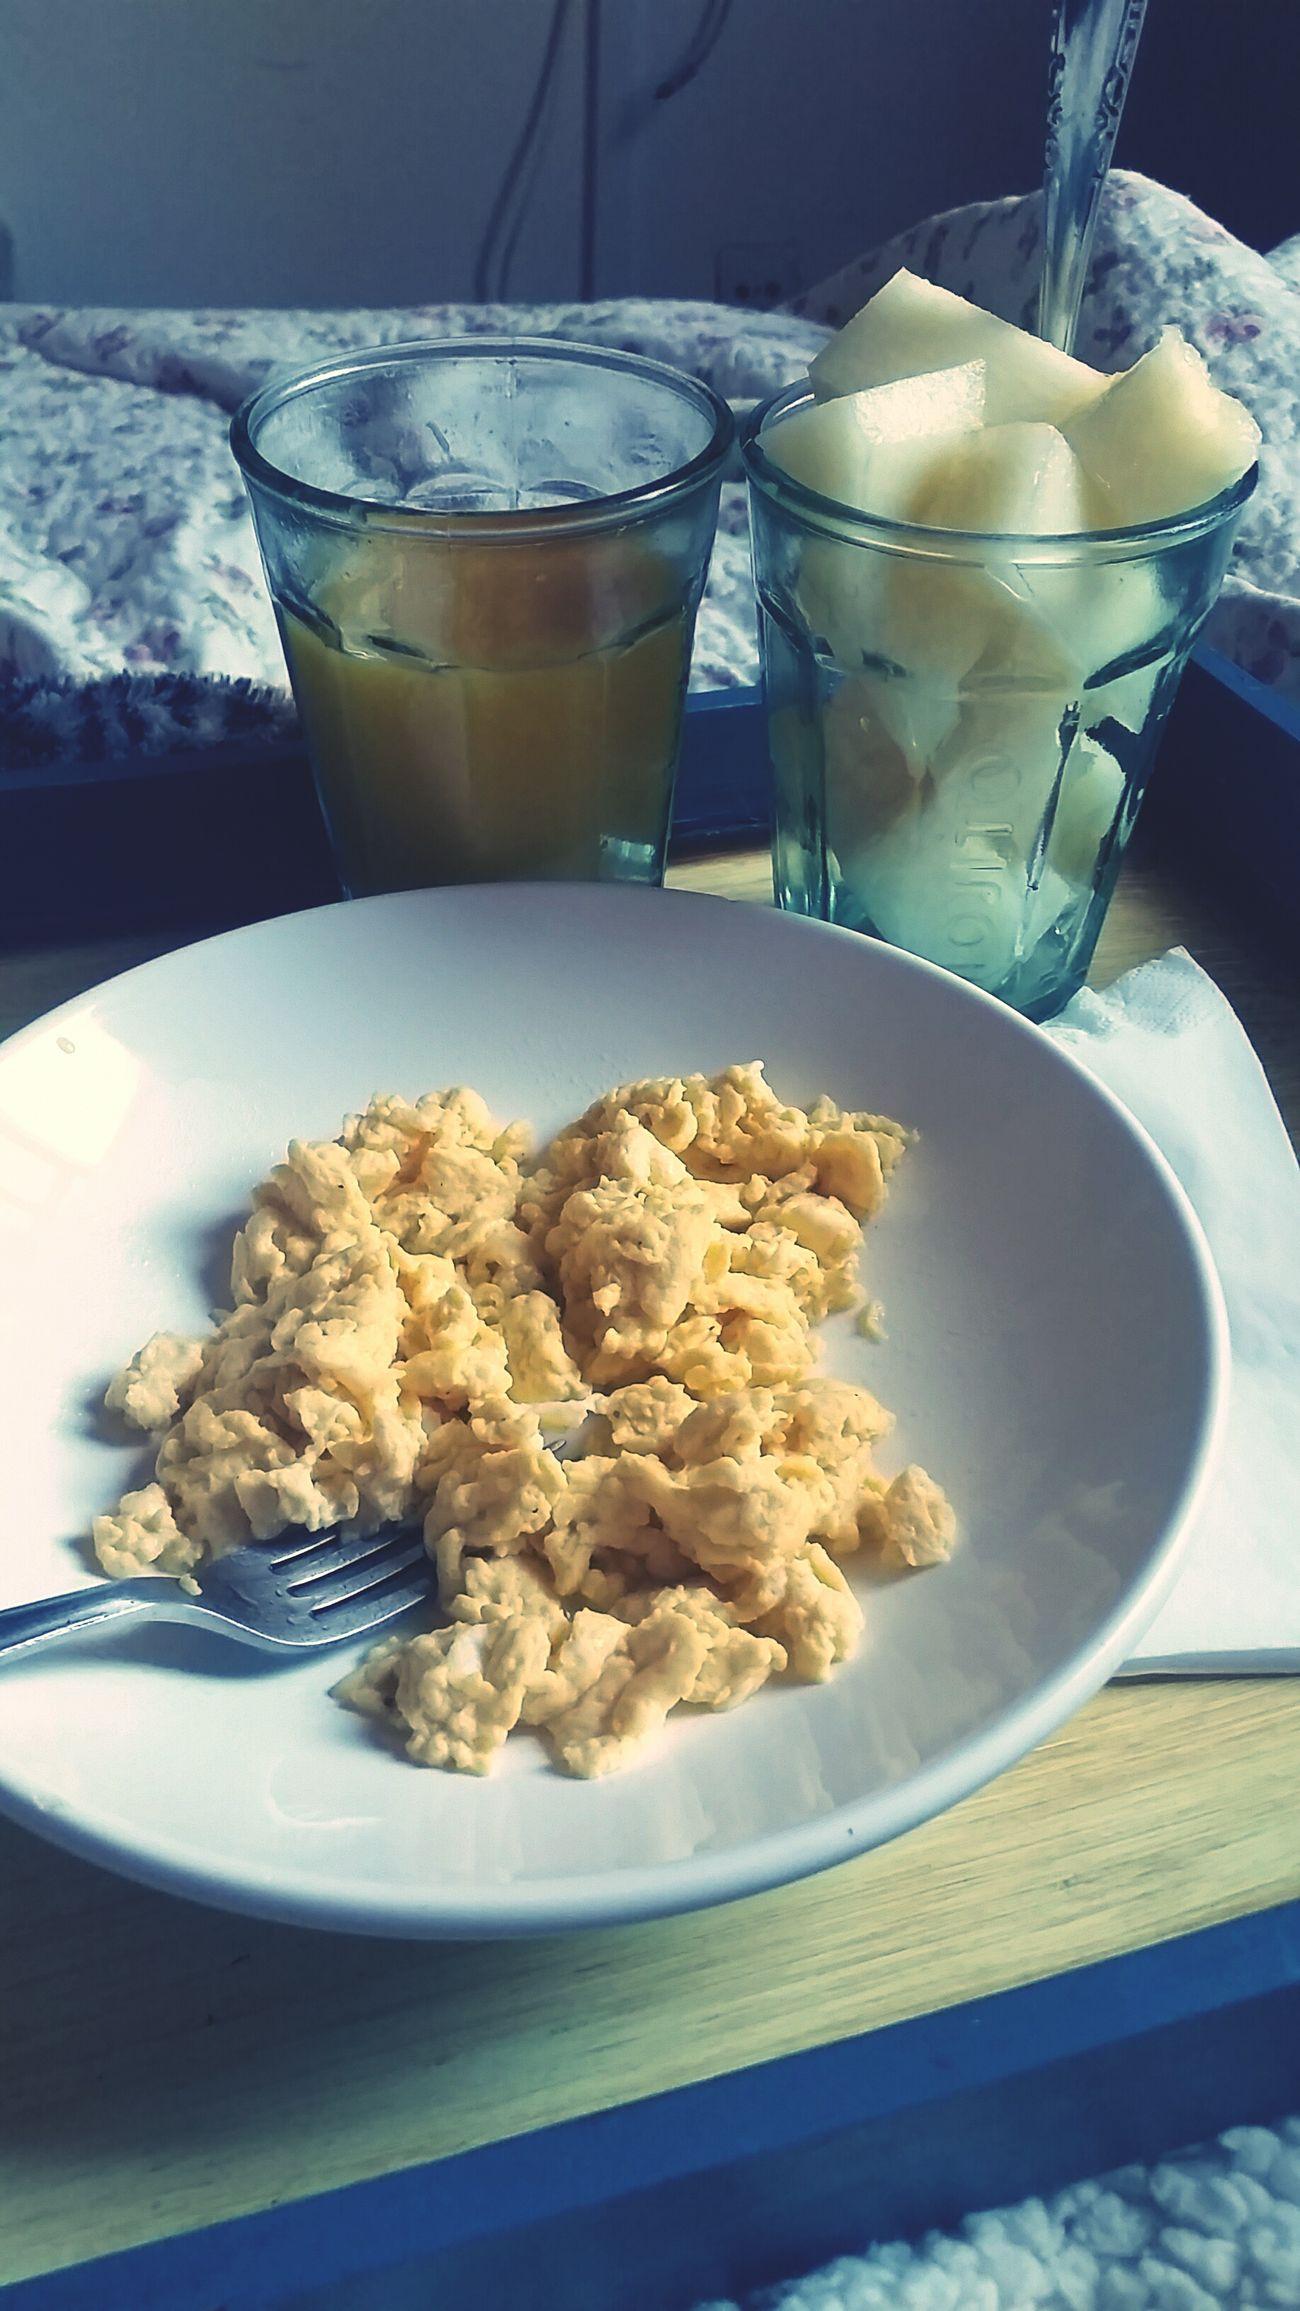 Breakfast InBed Scrumbleeggs Orangejuice Melon Perfect